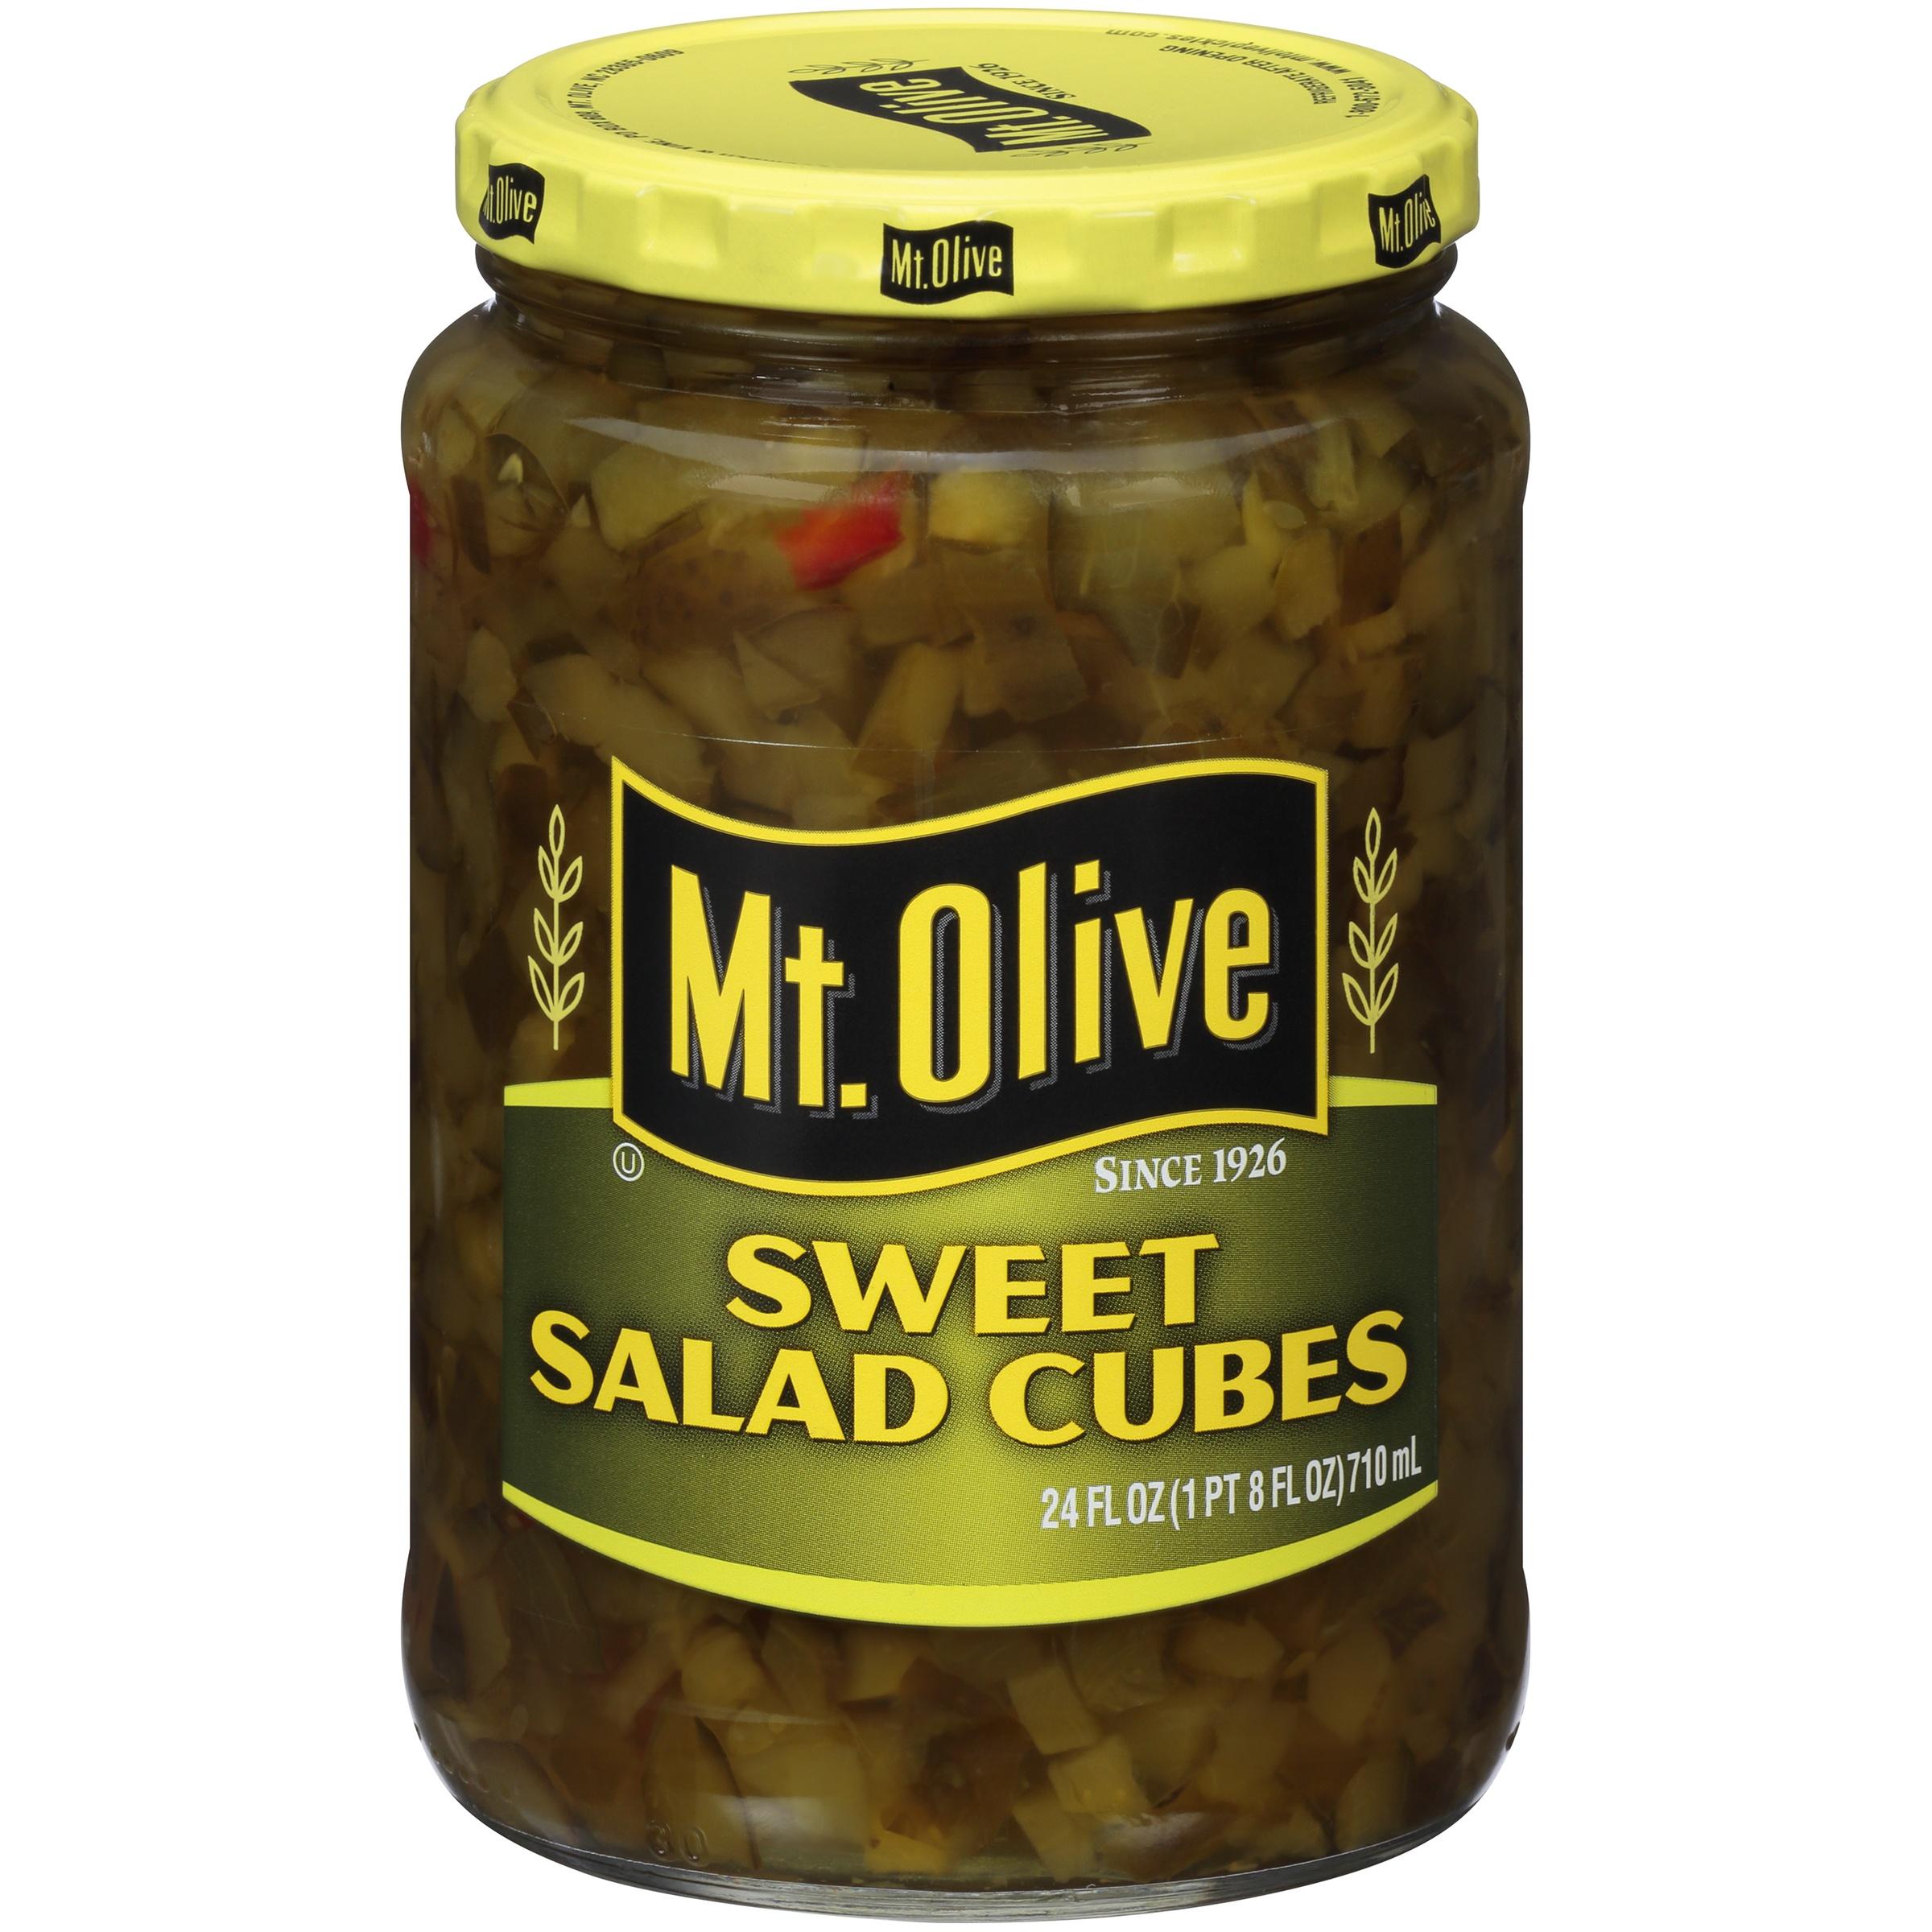 Mt. Olive Sweet Salad Cubes 24 fl. oz. Jar